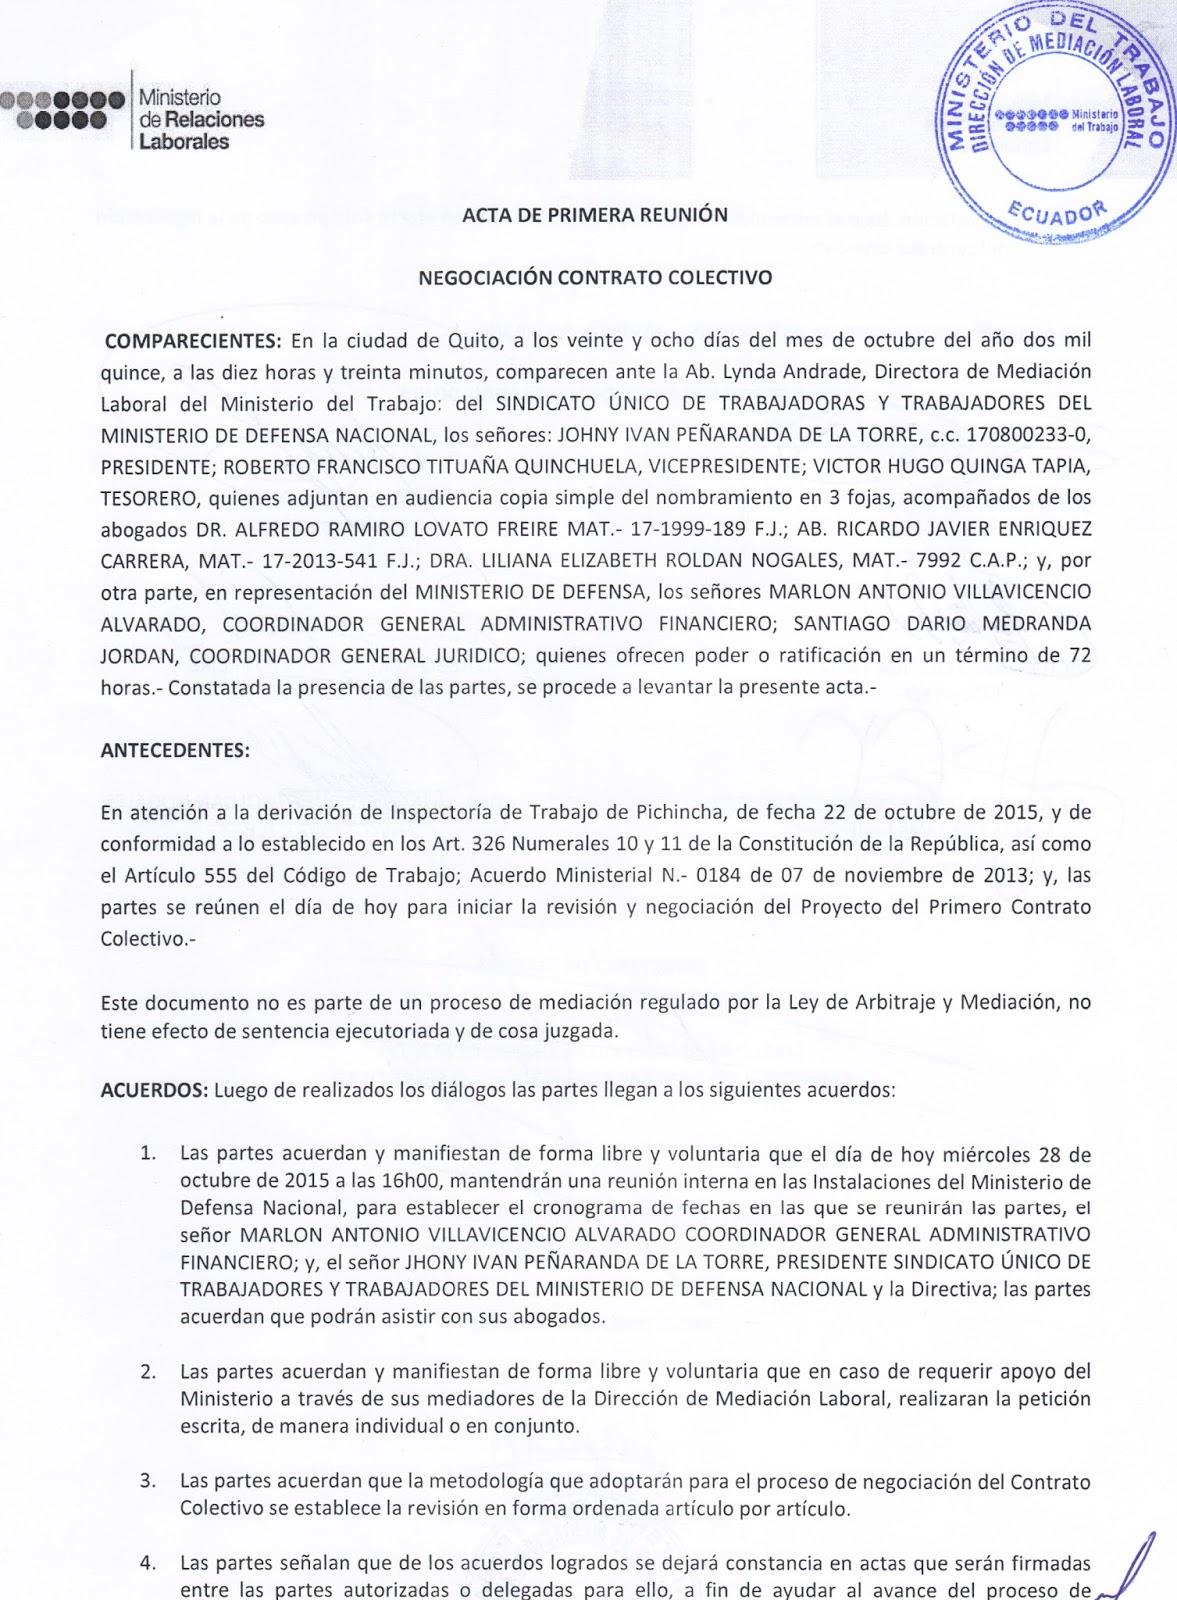 Sindicato midena comunicado urgente for Buro juridico